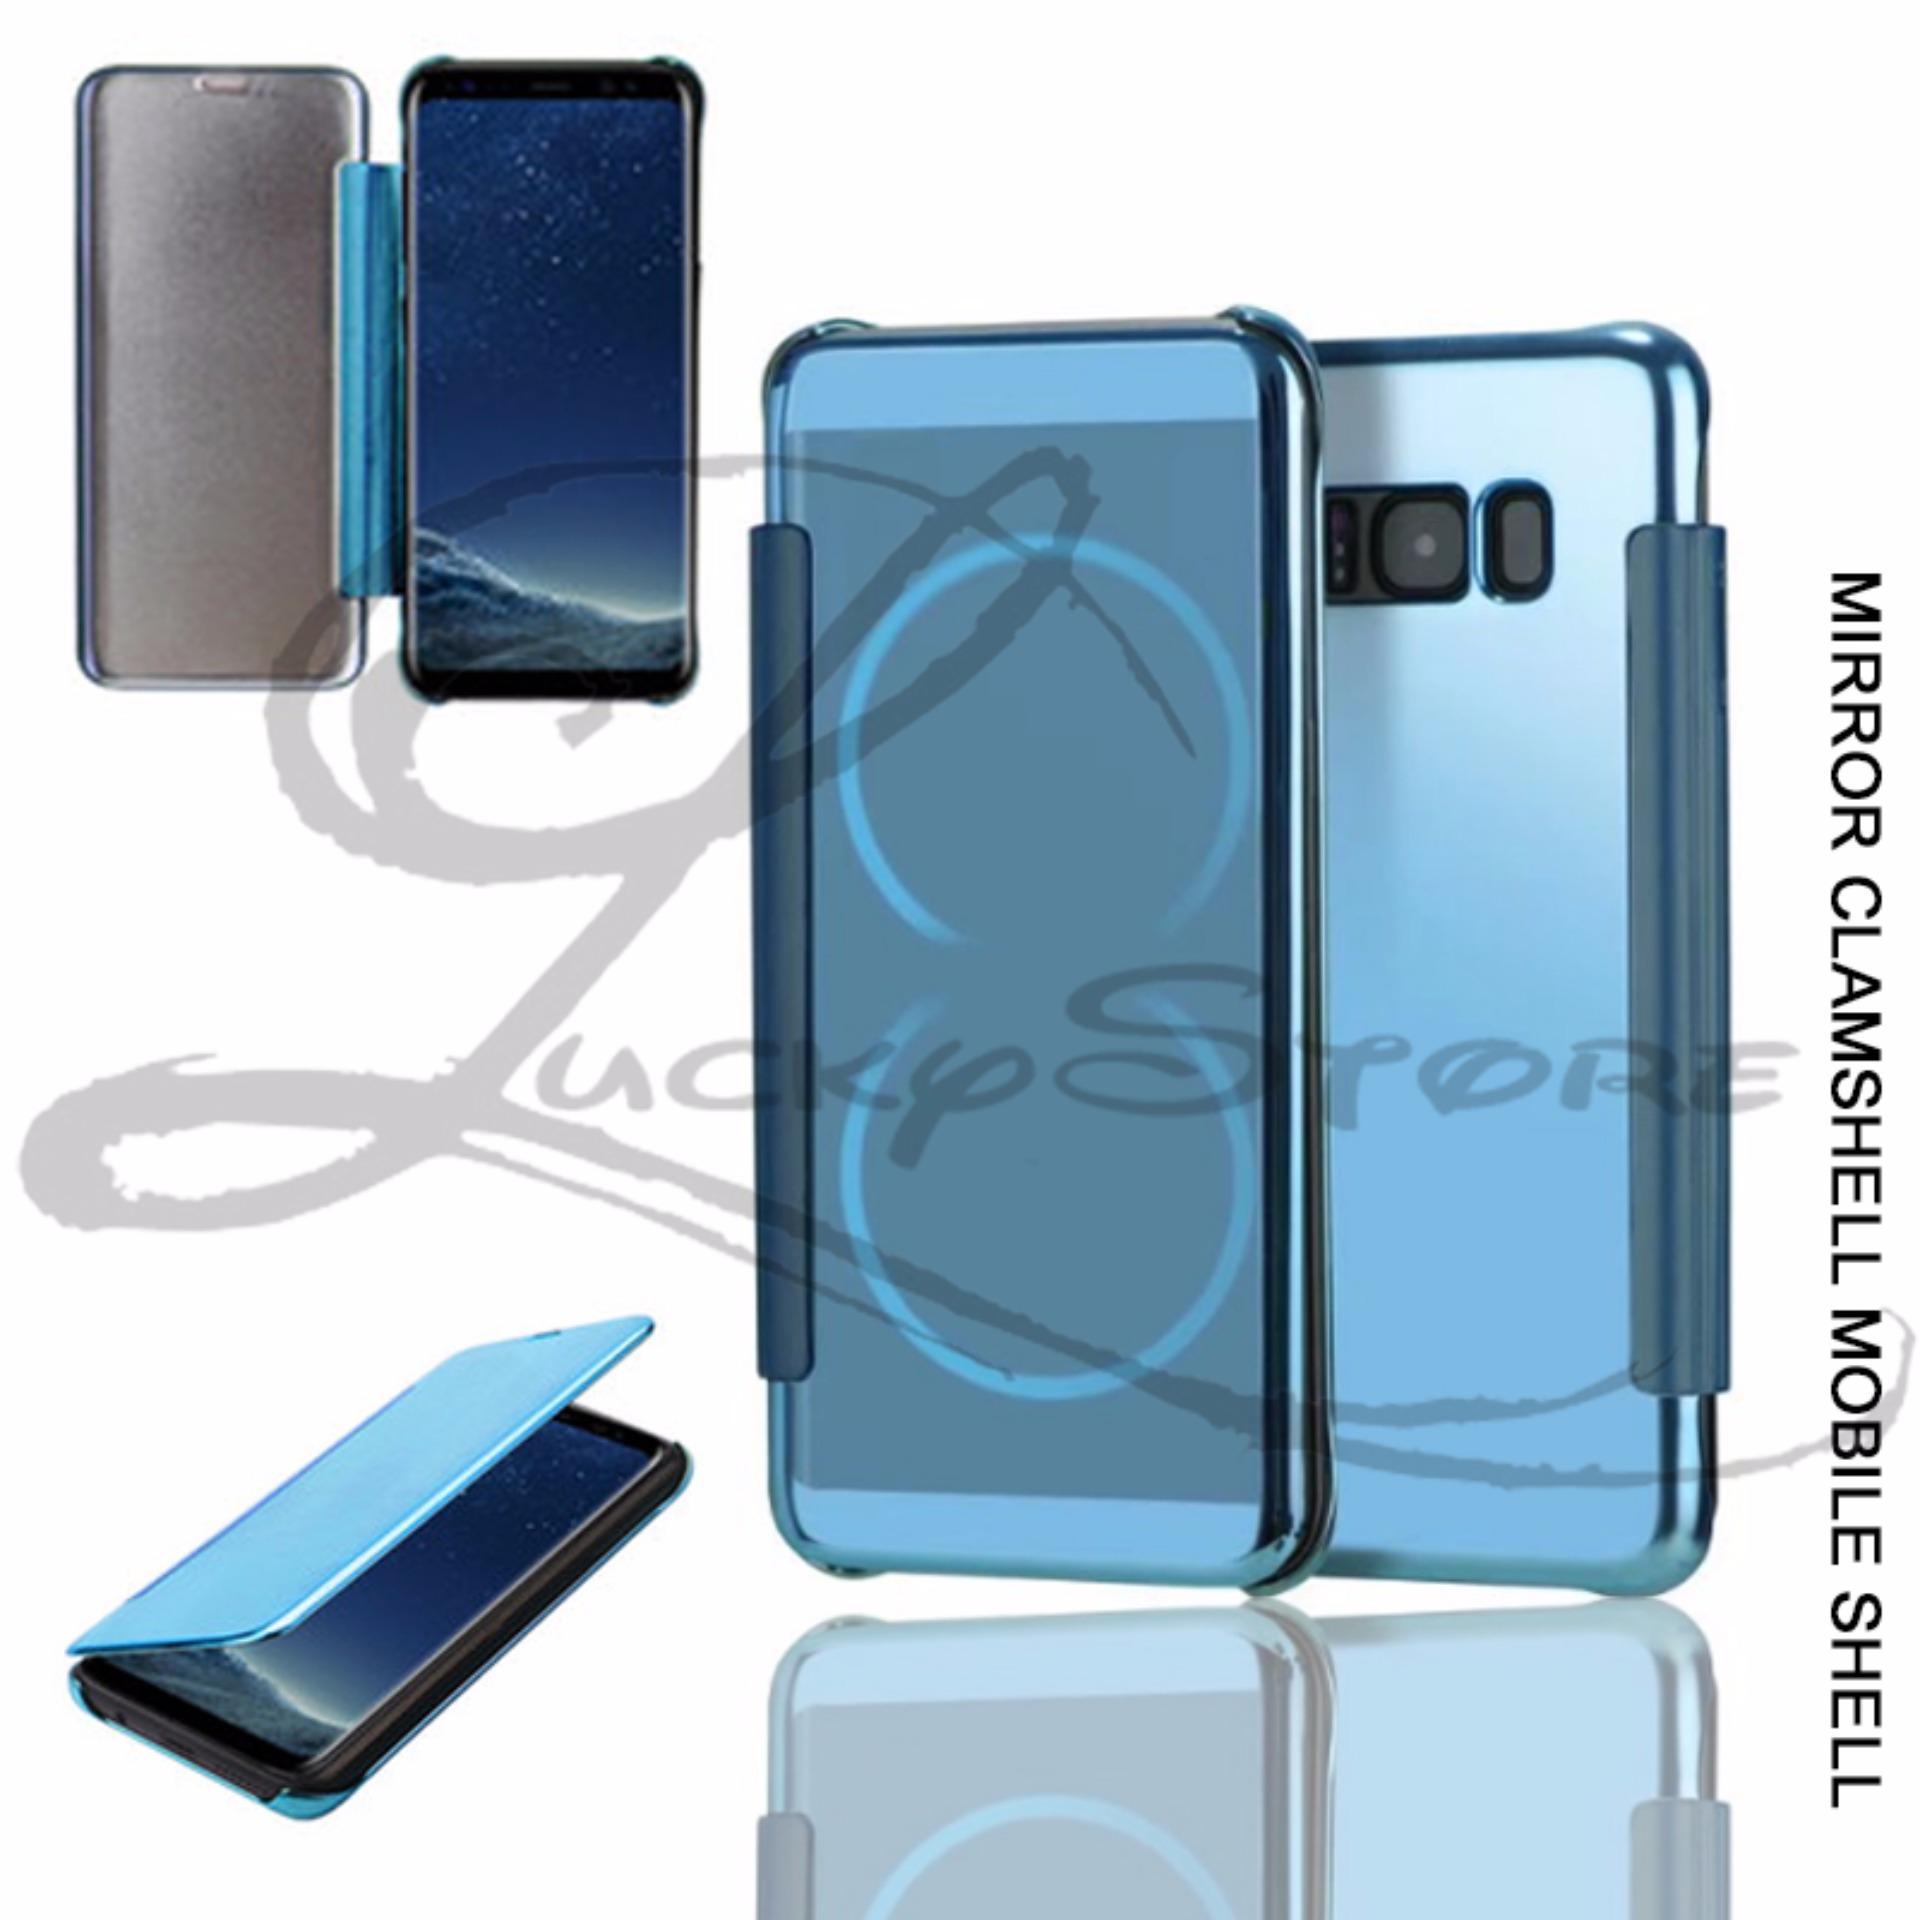 ... Lucky Case Samsung Galaxy S8 Flipcase Flip Mirror Cover S View Transparan Auto Lock Casing Hp ...